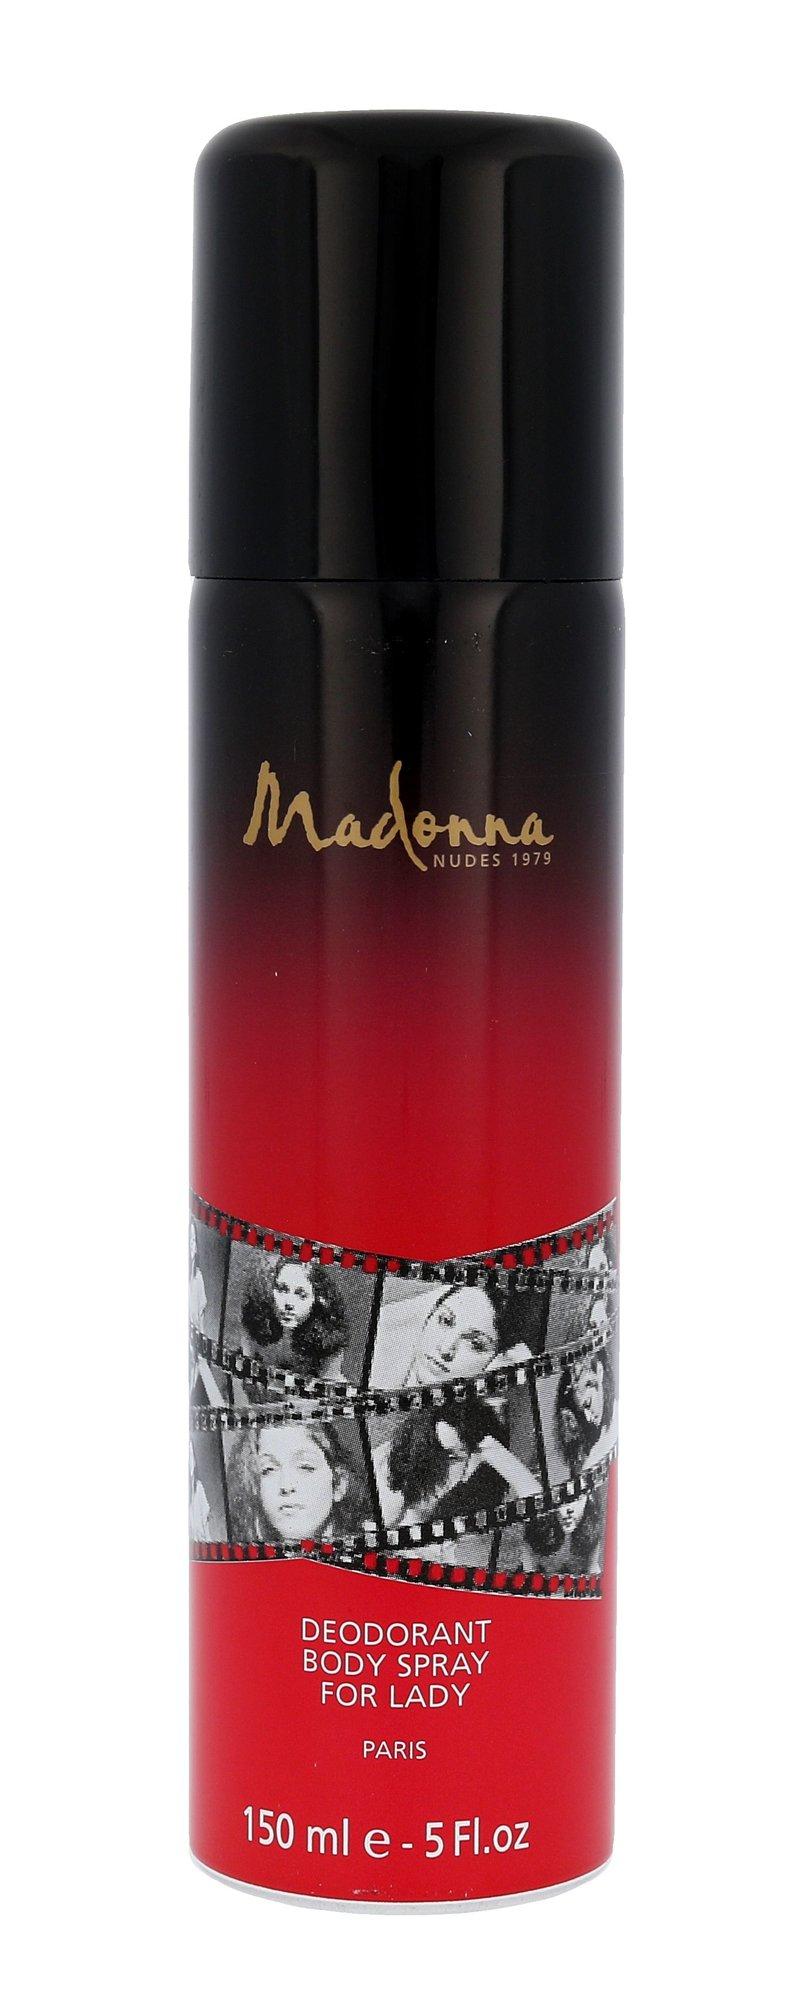 Madonna Nudes 1979 Madonna Lady Deodorant 150ml